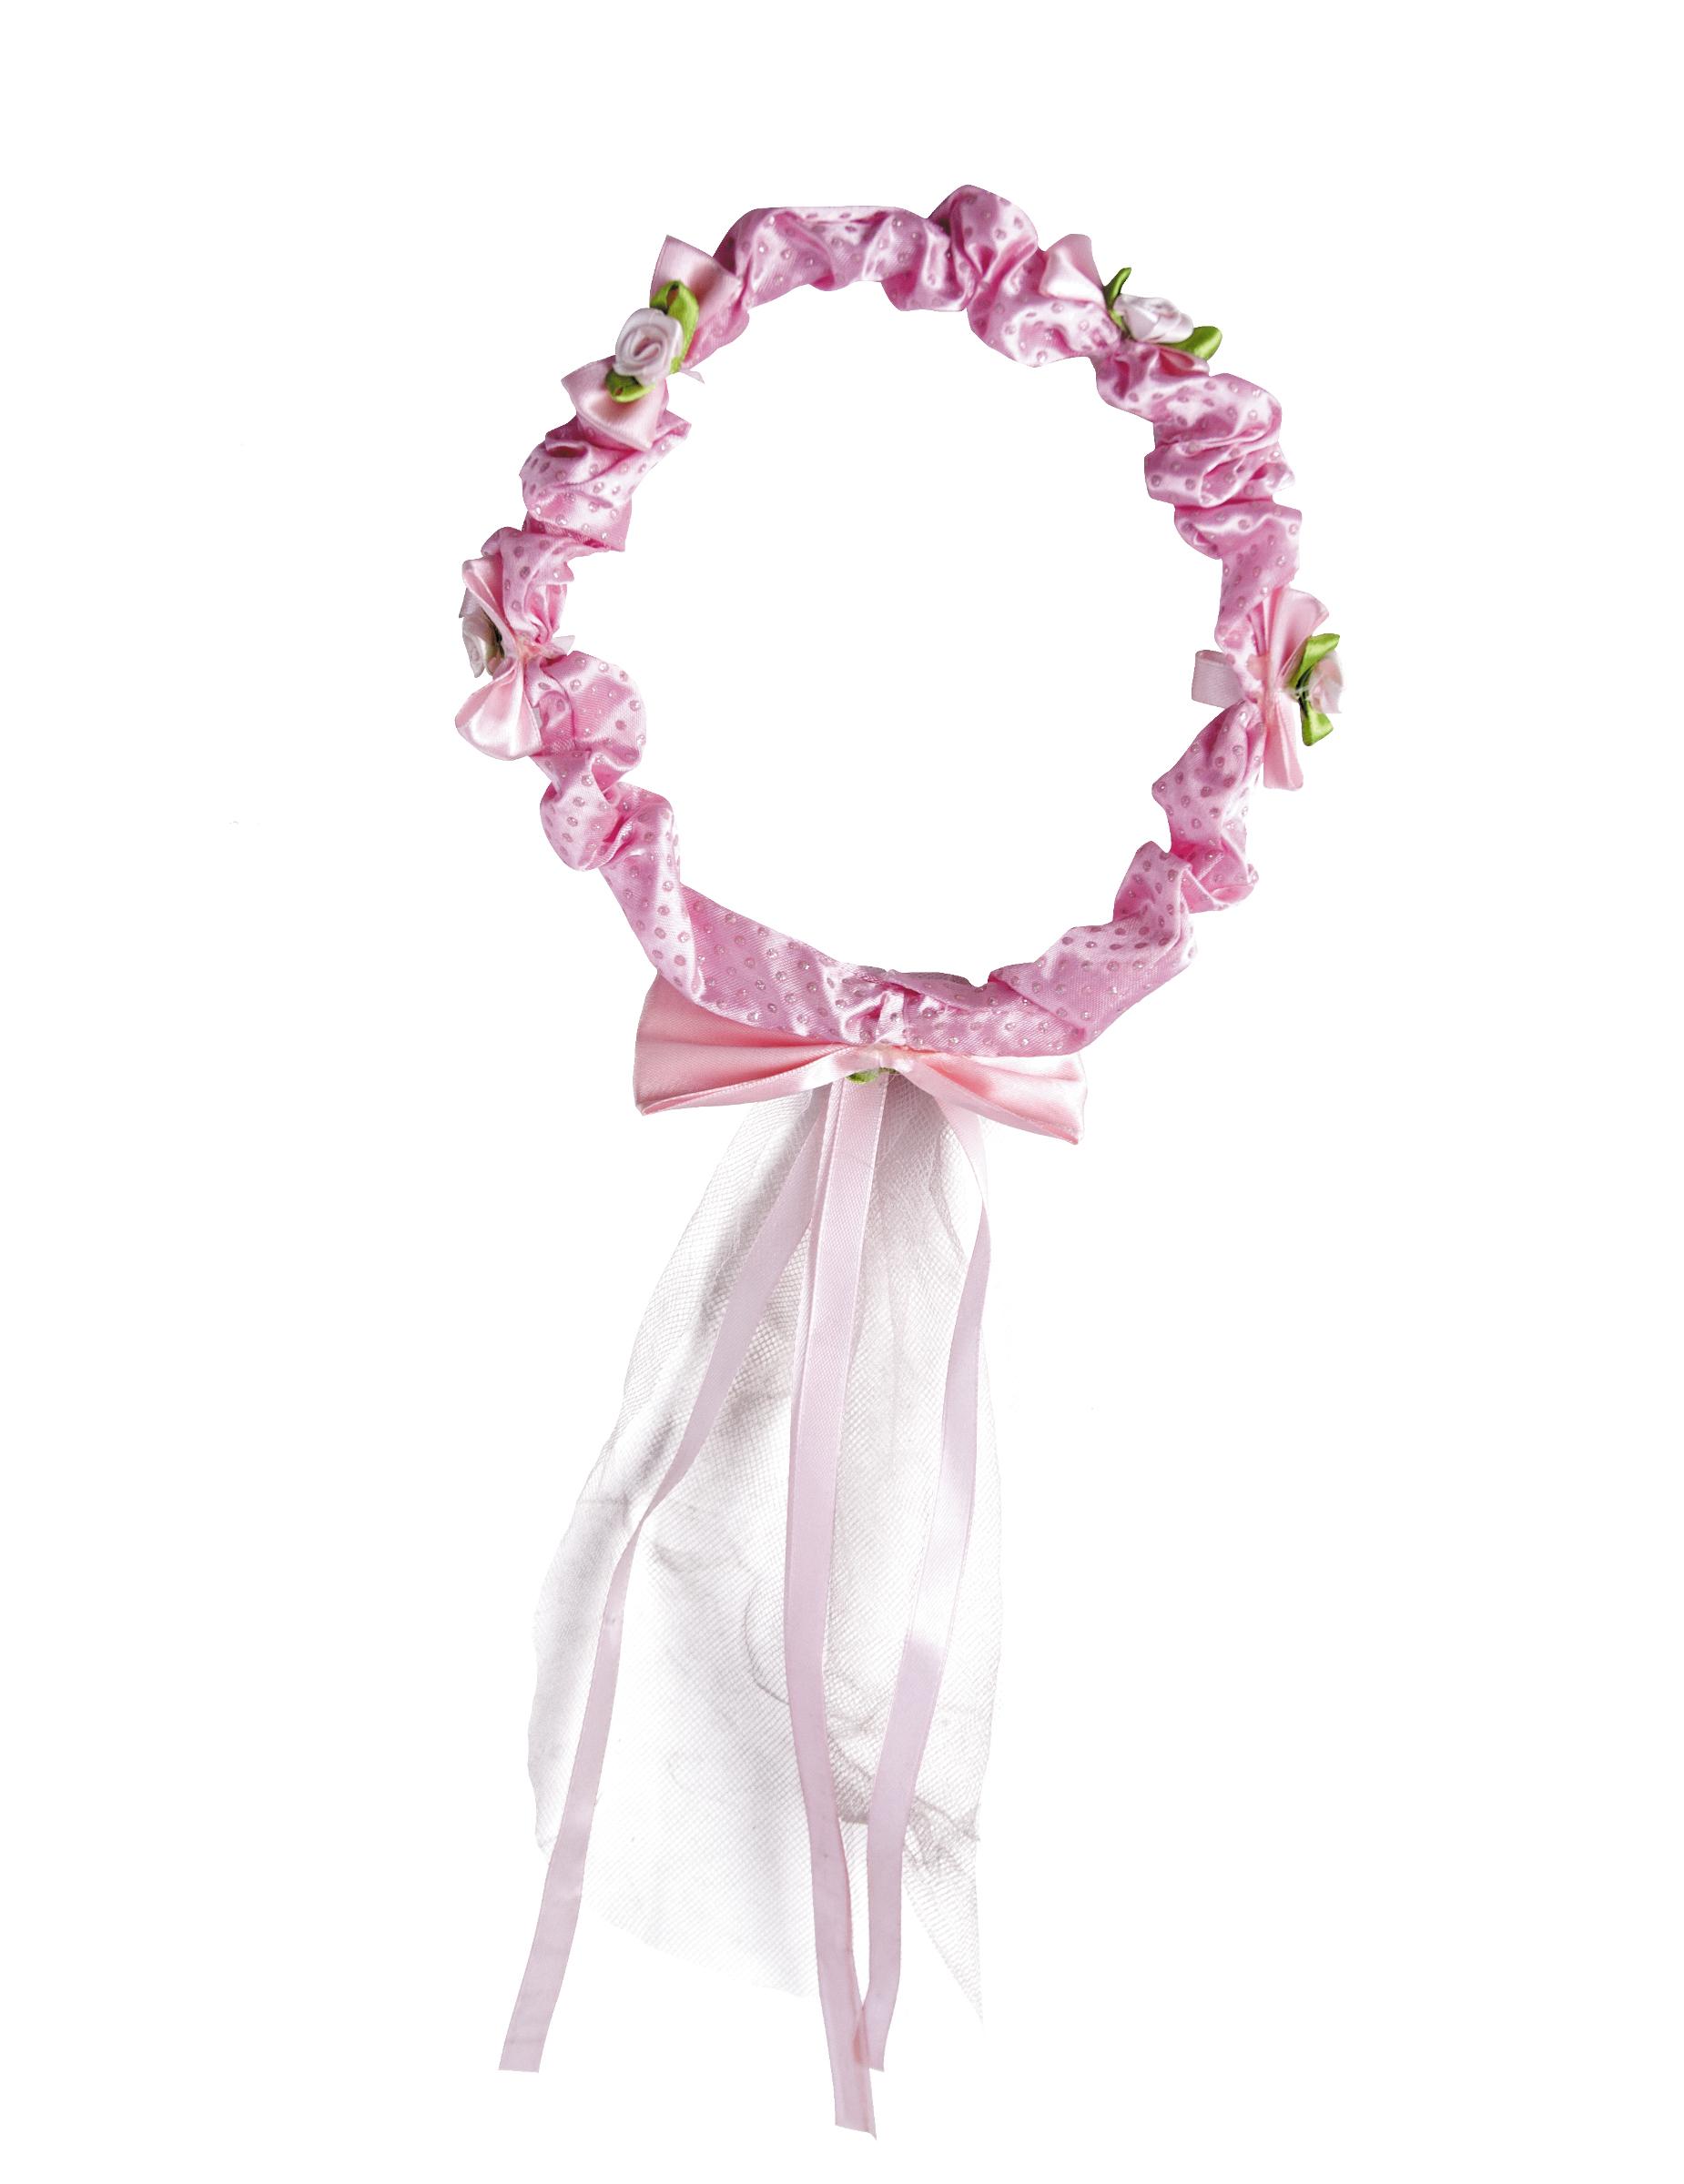 Corona de flores rosas con lazo para Nia Accesoriosy disfraces